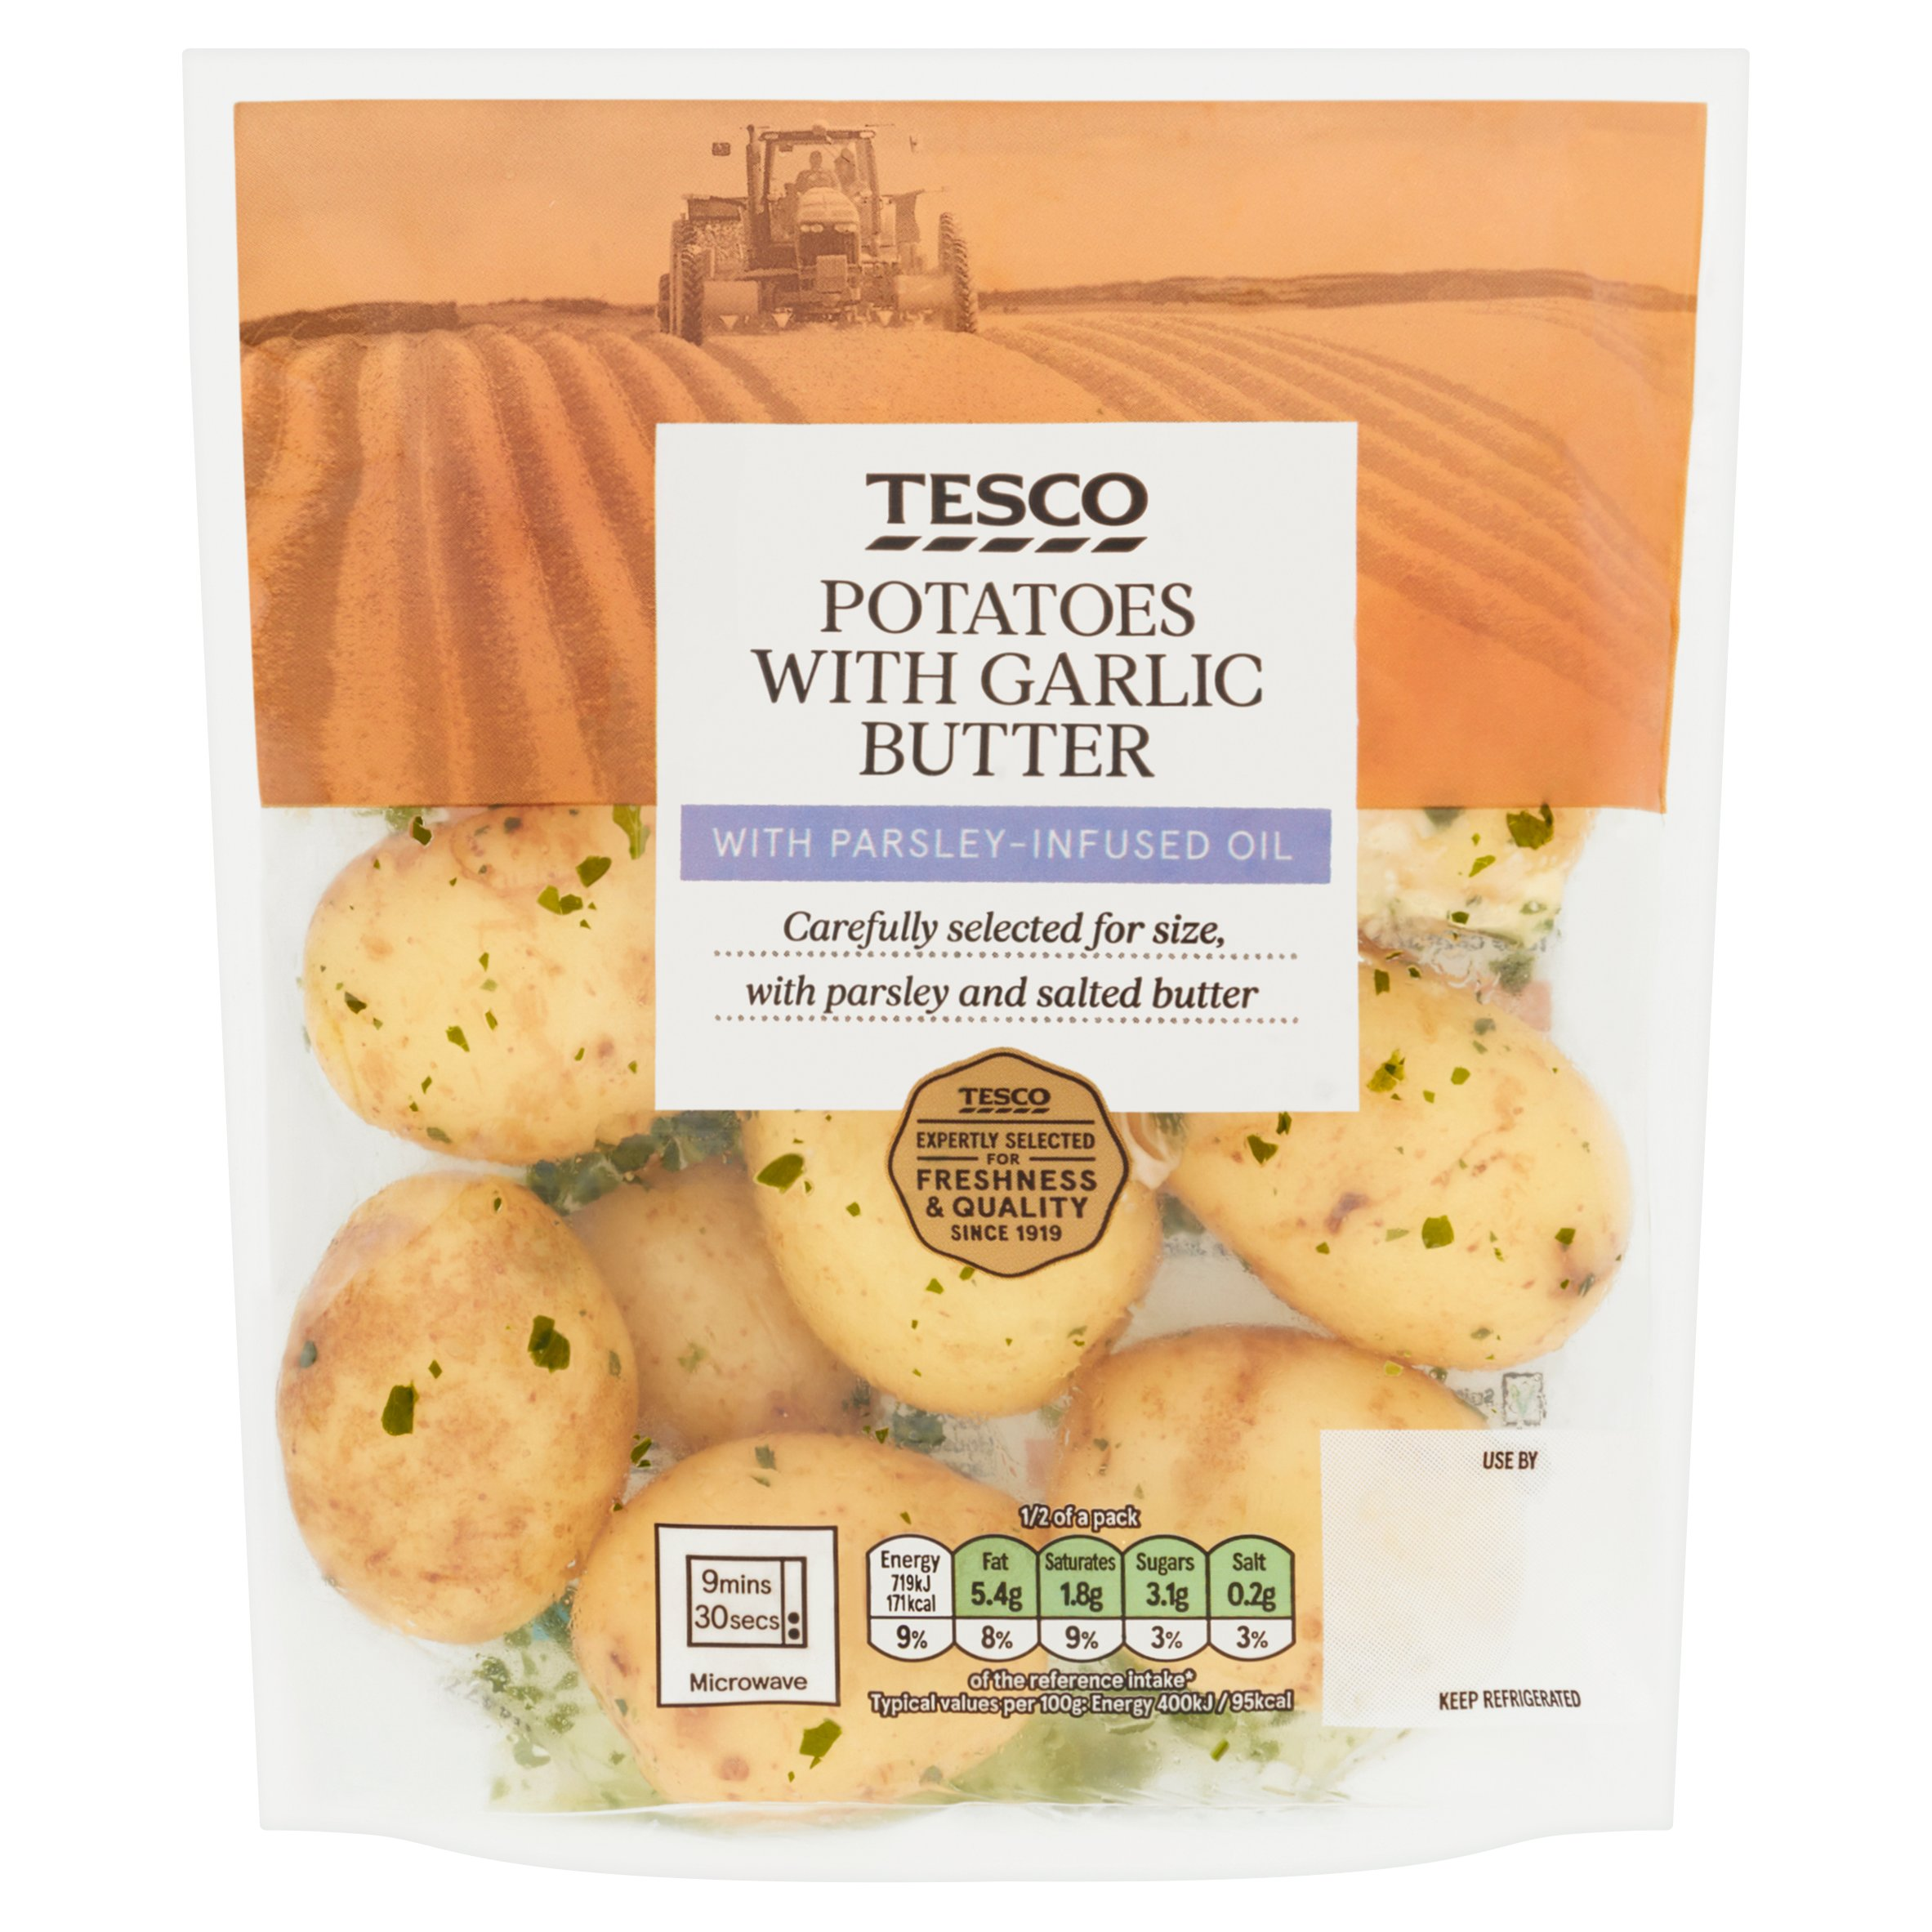 Tesco Potatoes With Garlic Butter 360G